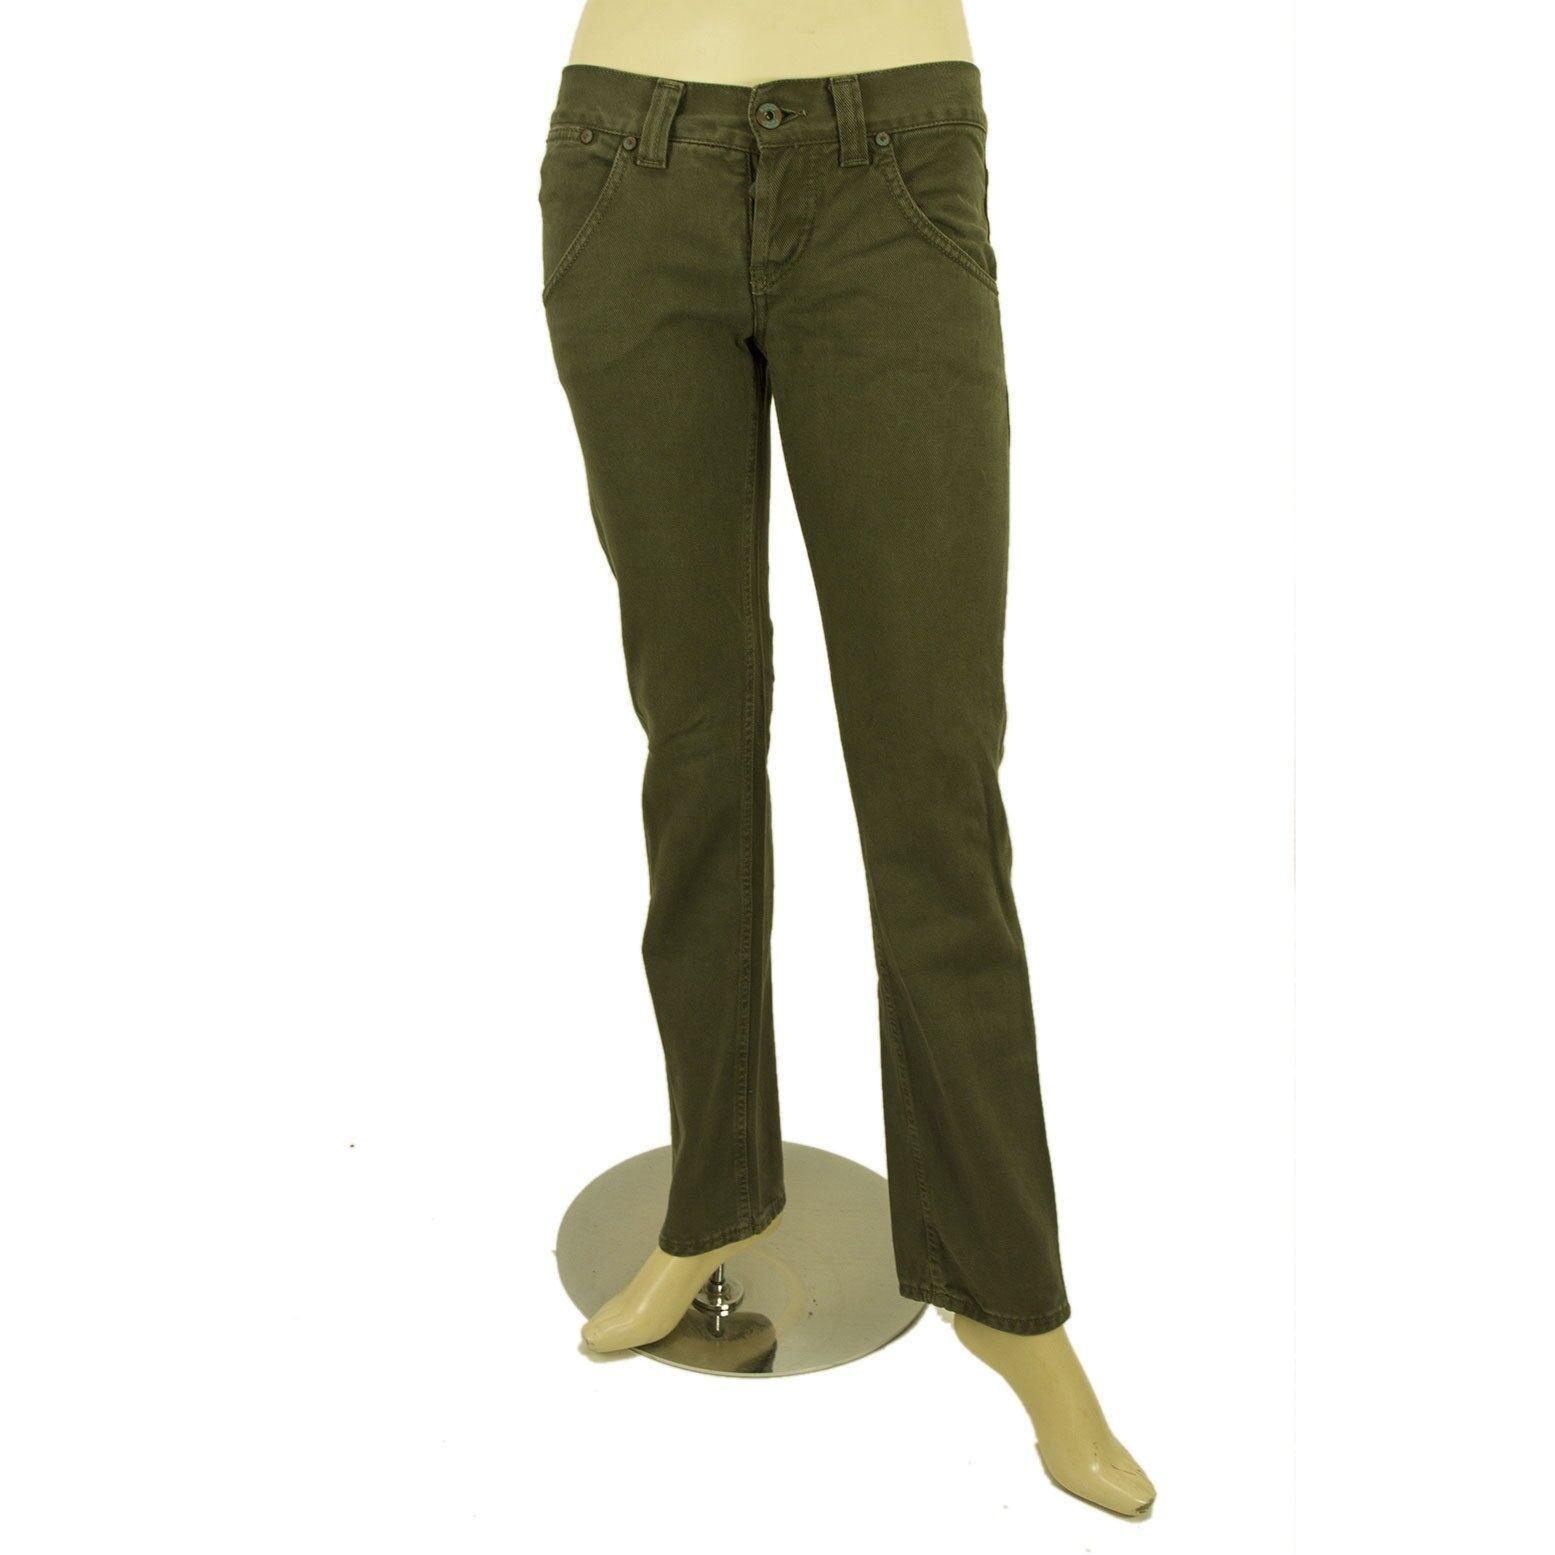 Dondup Olive Green Denim Jeans Slim Trousers Pants sz 26 P005 015 CLAY CARMEN